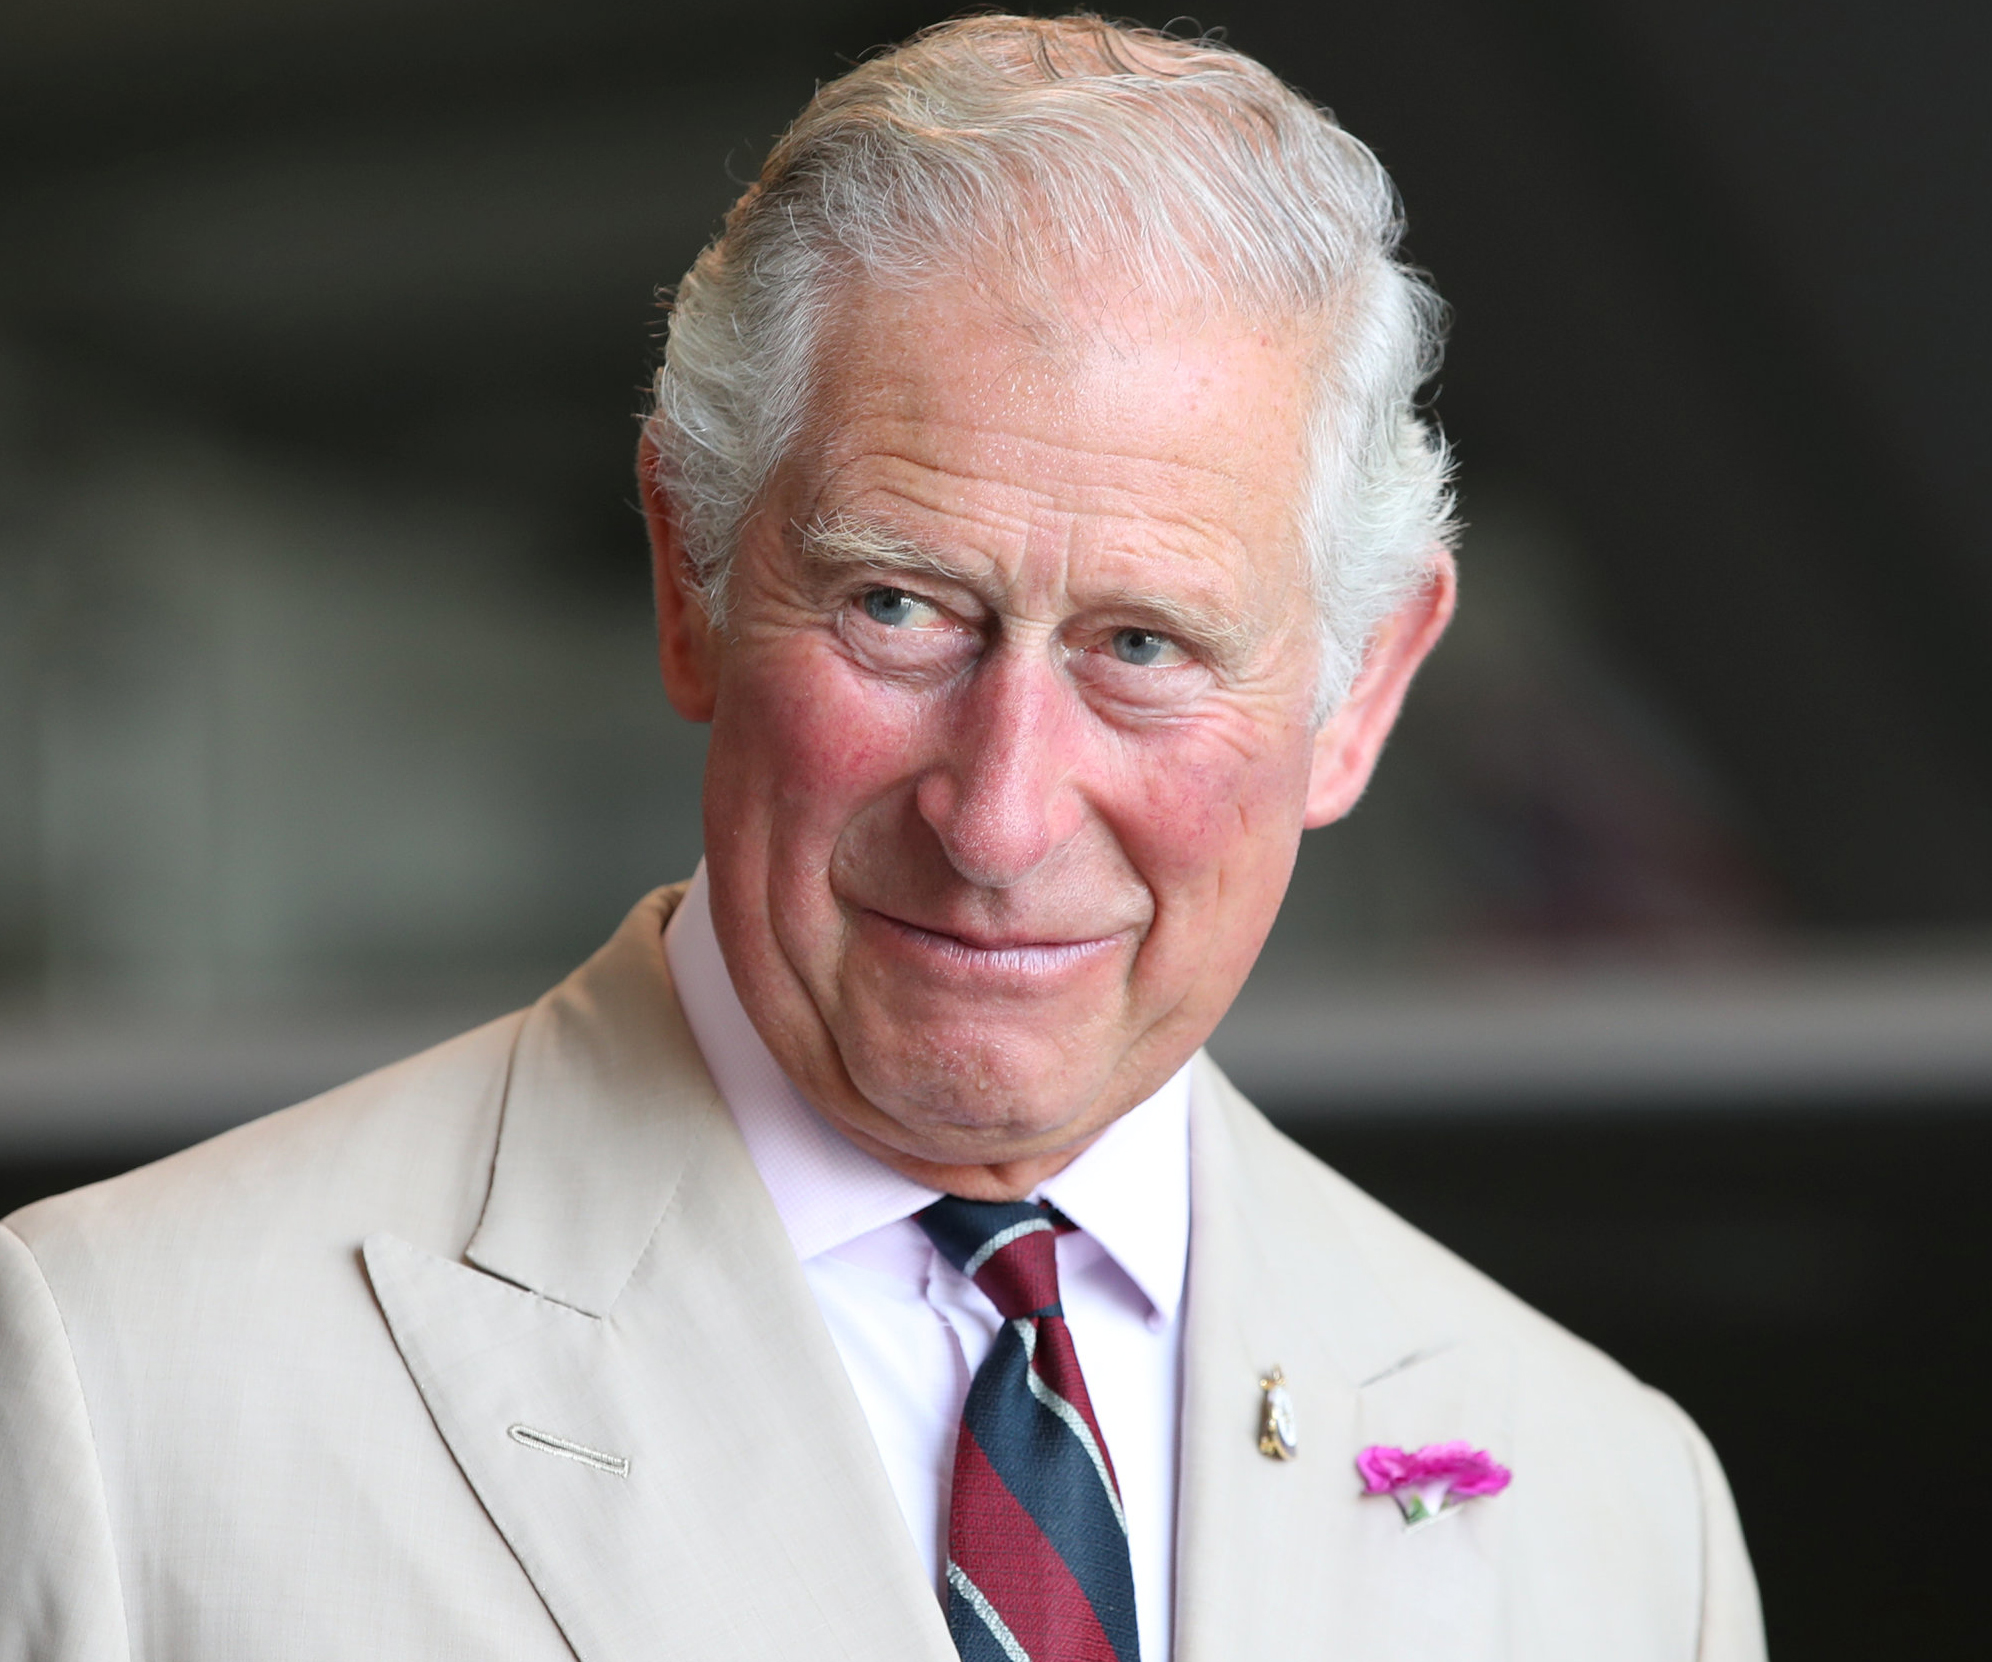 https://www.nowtolove.com.au/royals/british-royal-family/prince-harry ...